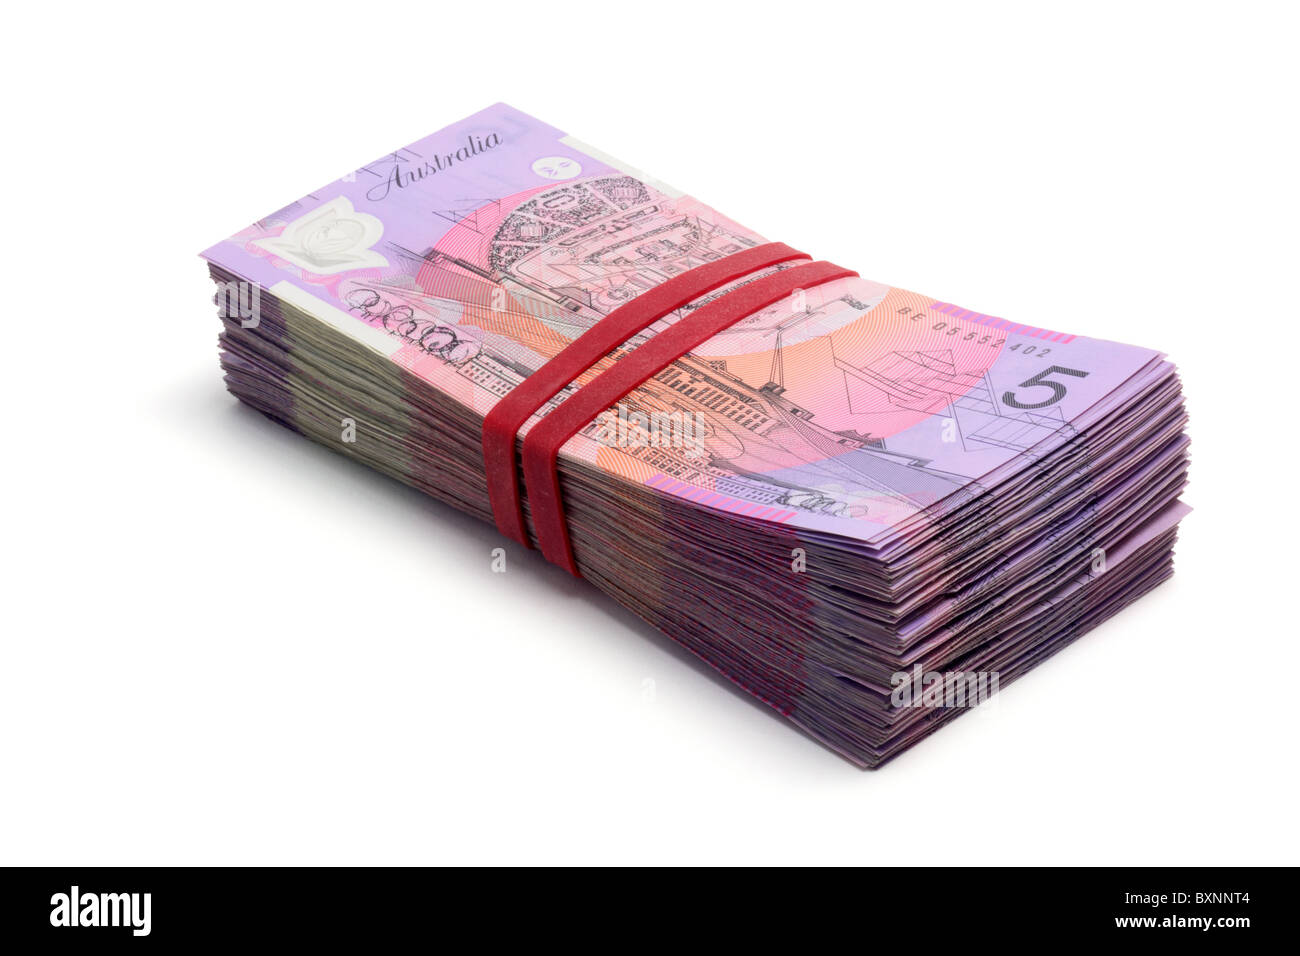 Bank Notes - Stock Image